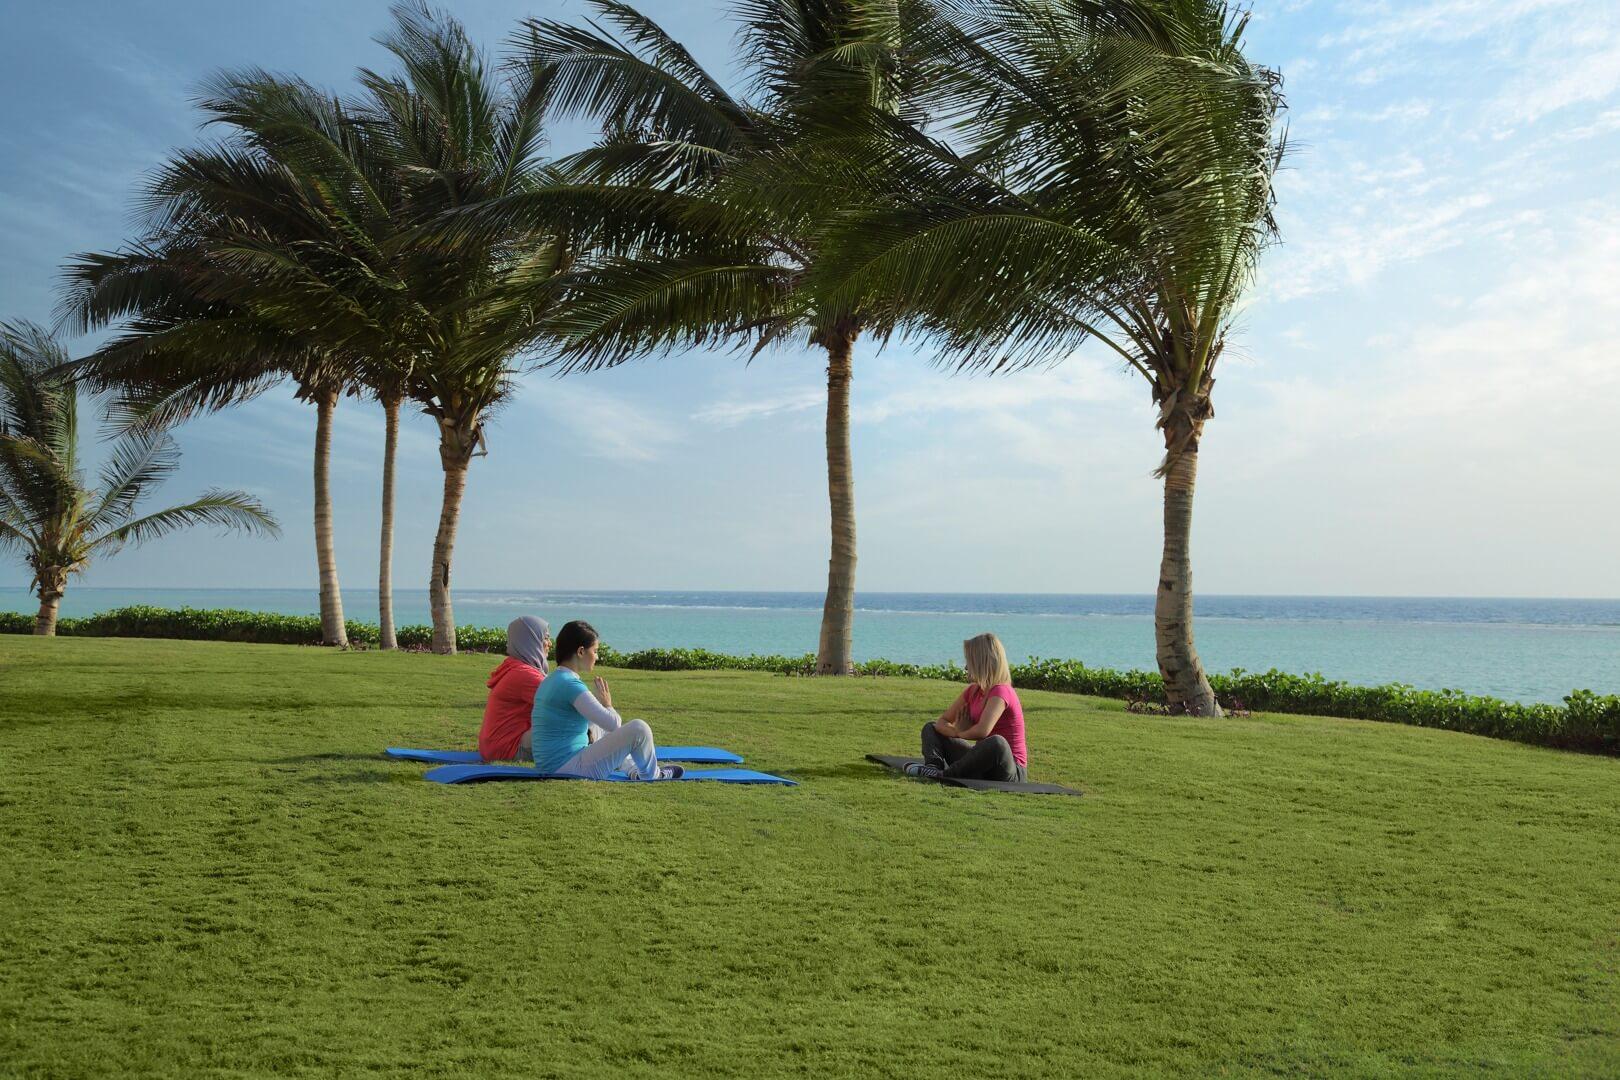 Al Murooj beach - KAEC